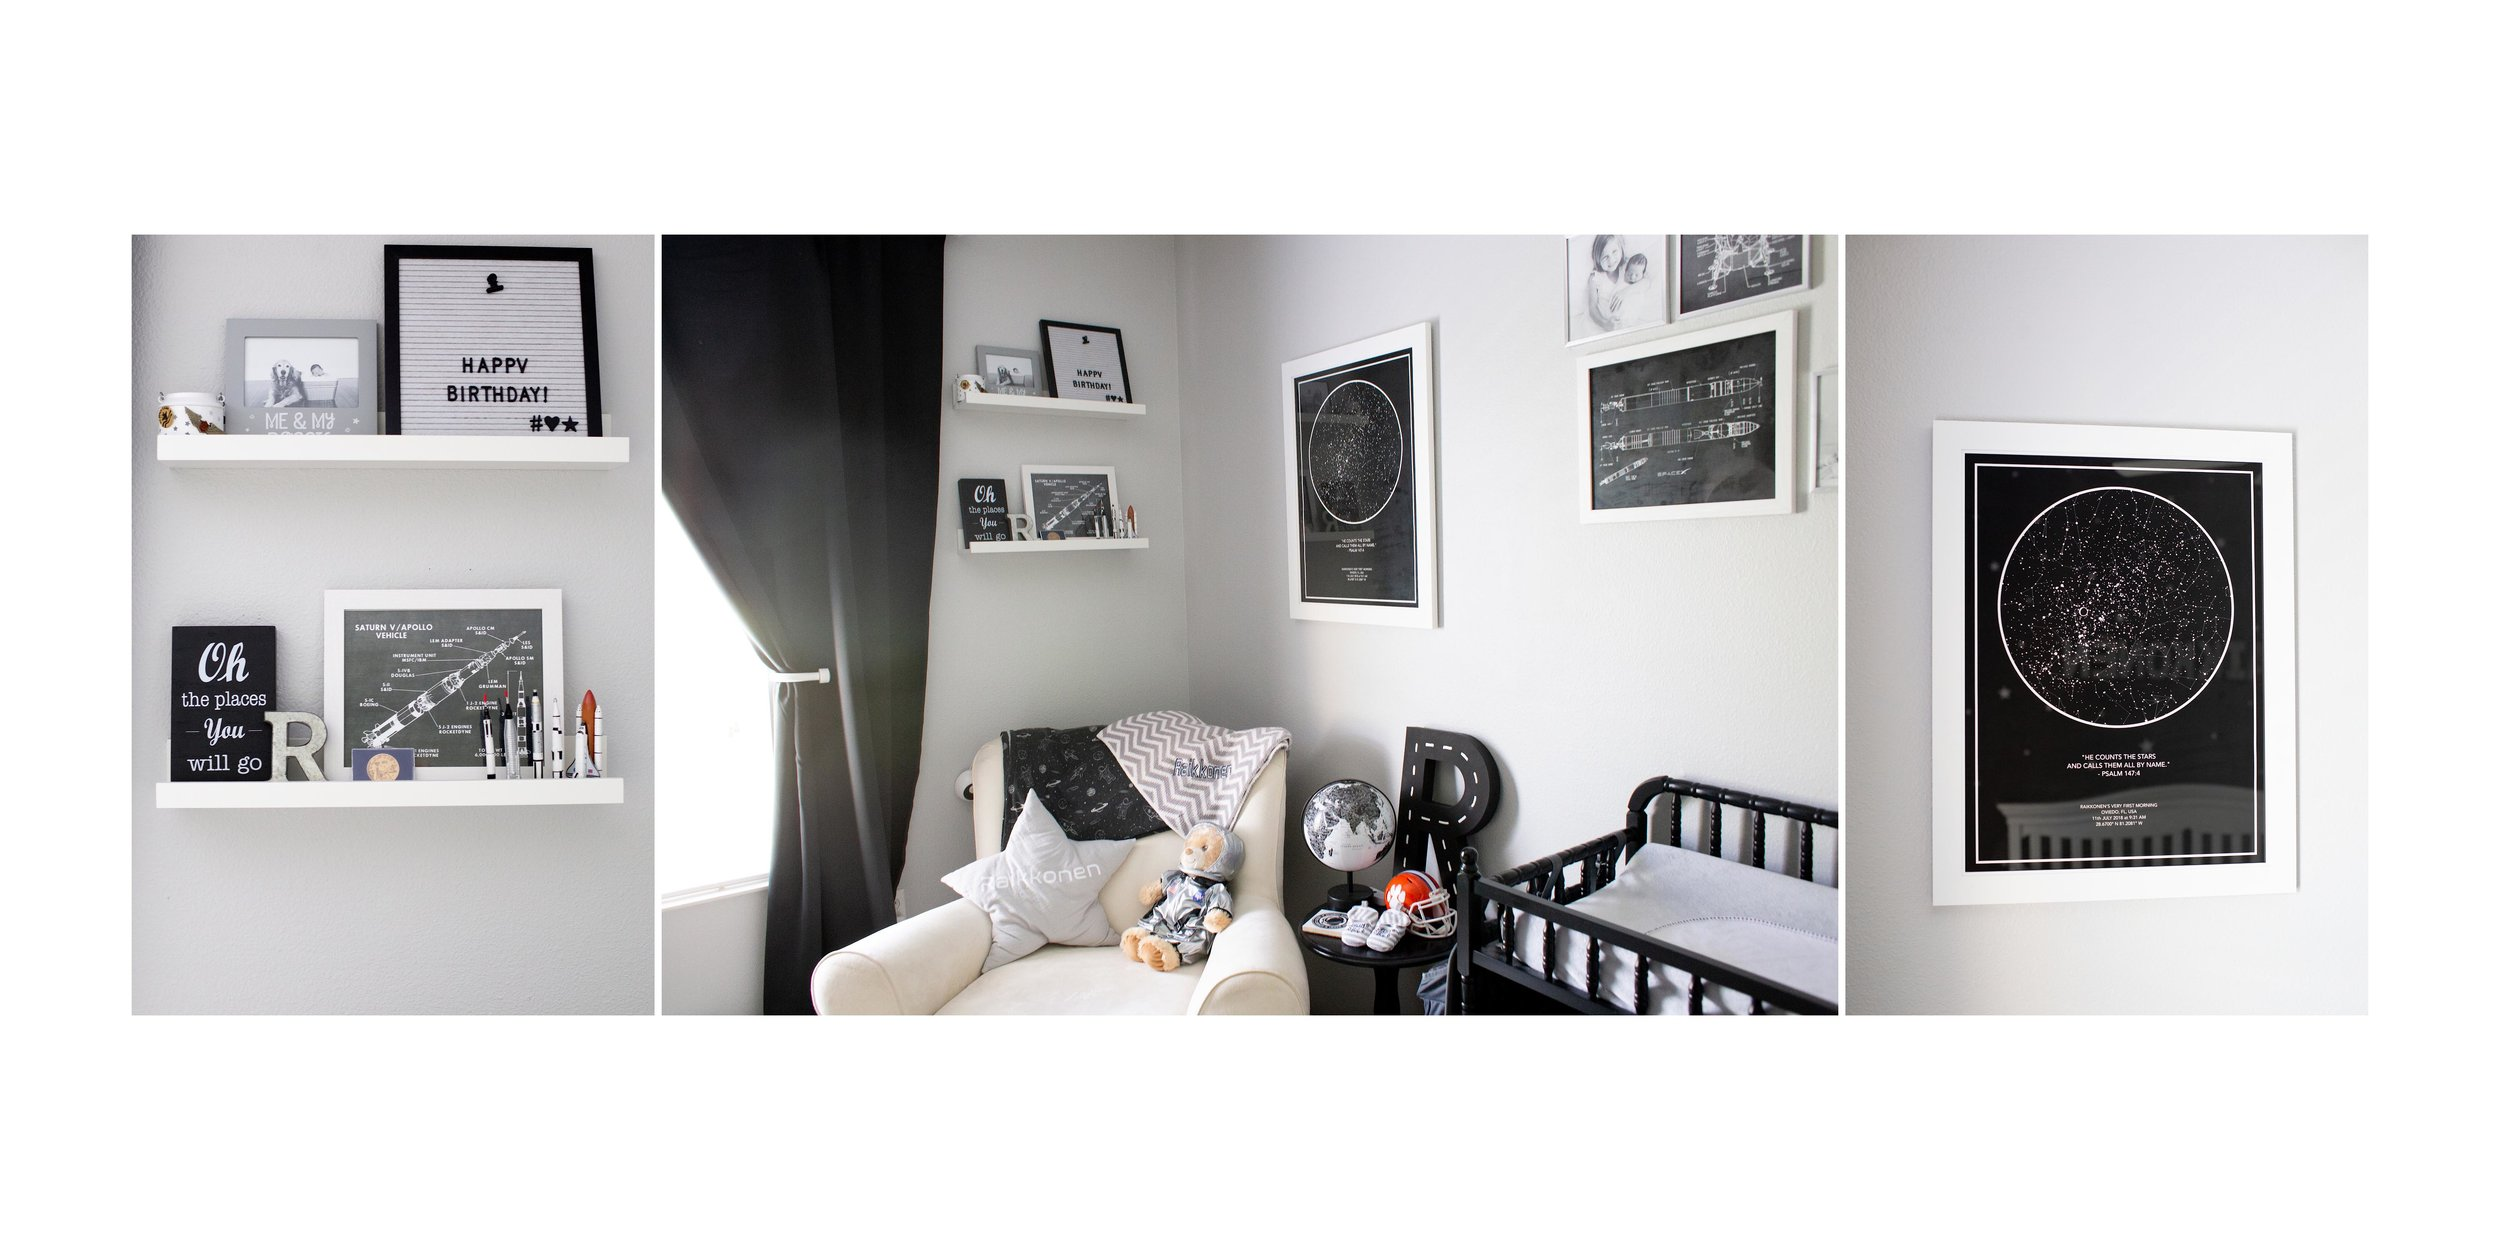 Raikkonen's_room_07.jpg